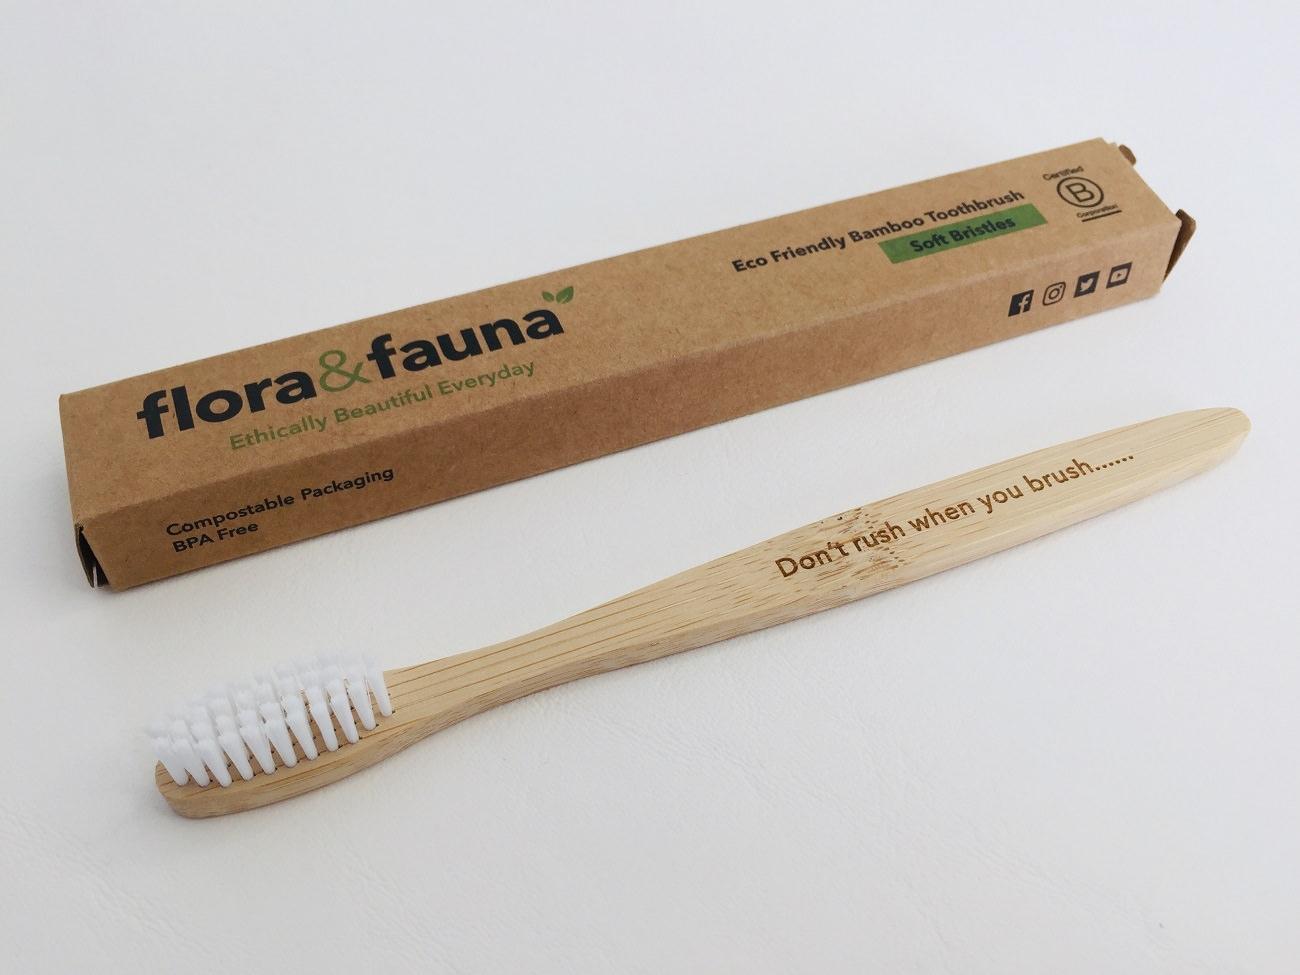 Flora & Fauna Bamboo Toothbrush Feature image